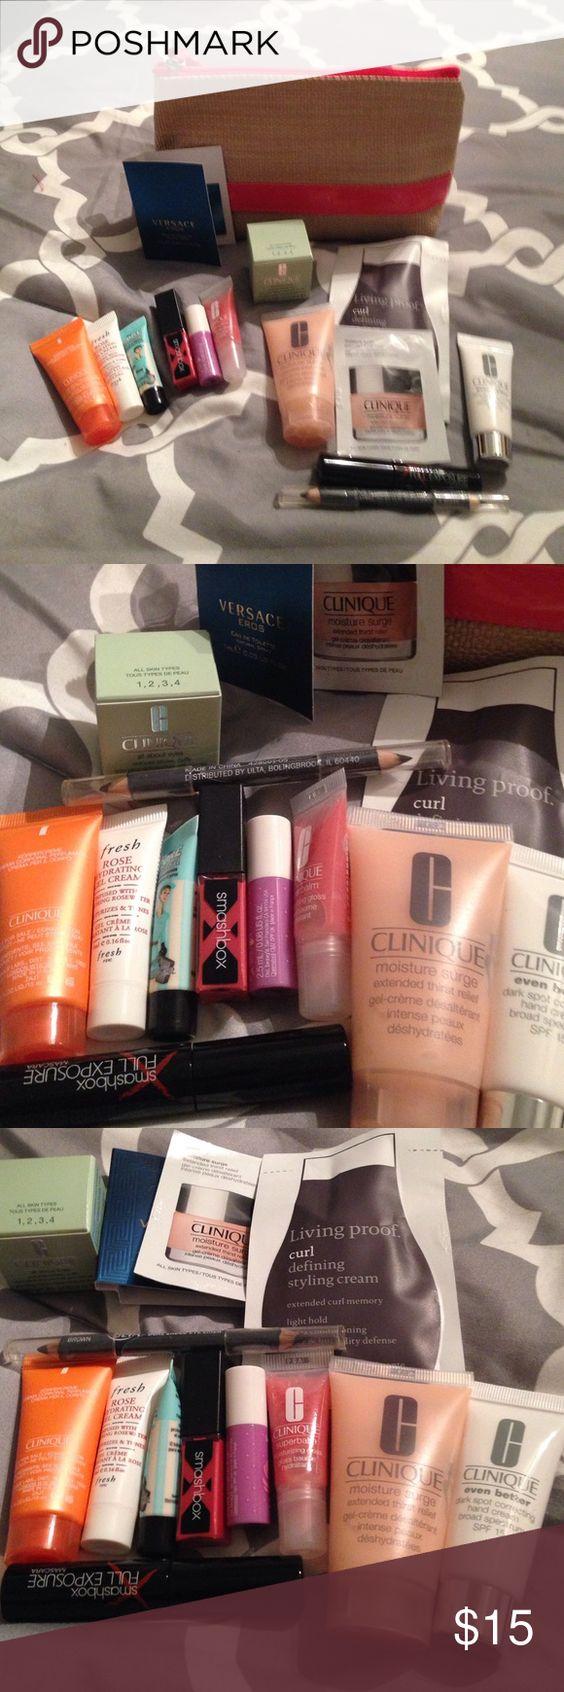 Grab bag of makeup samples. Never used! Ulta makeup bag with lots of samples. Mascara, lip gloss, eyeliner, sample perfume, face creams and hand creams. 14 samples in all. Makeup